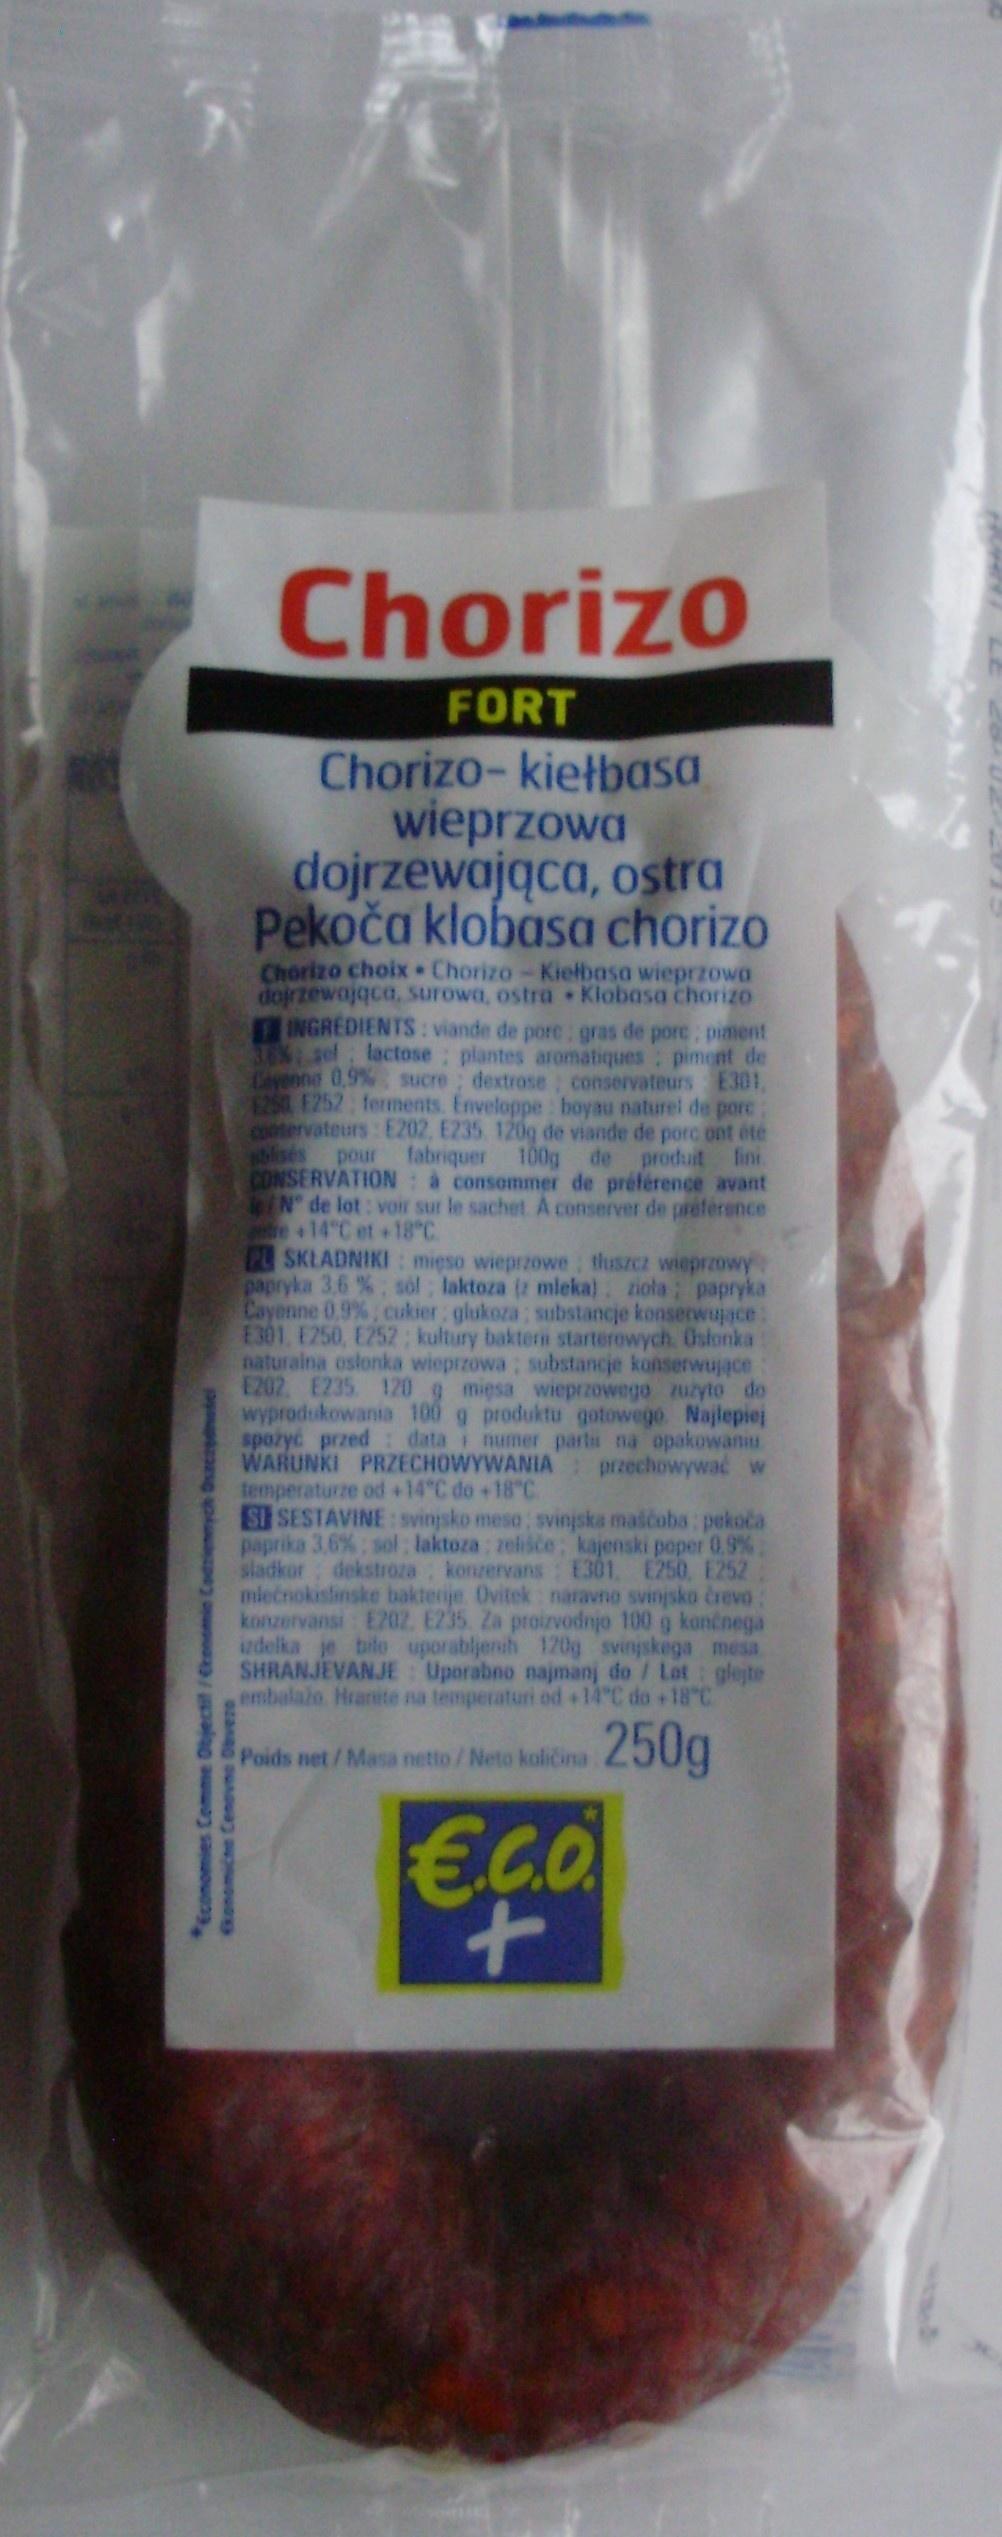 Chorizo (Fort) - Product